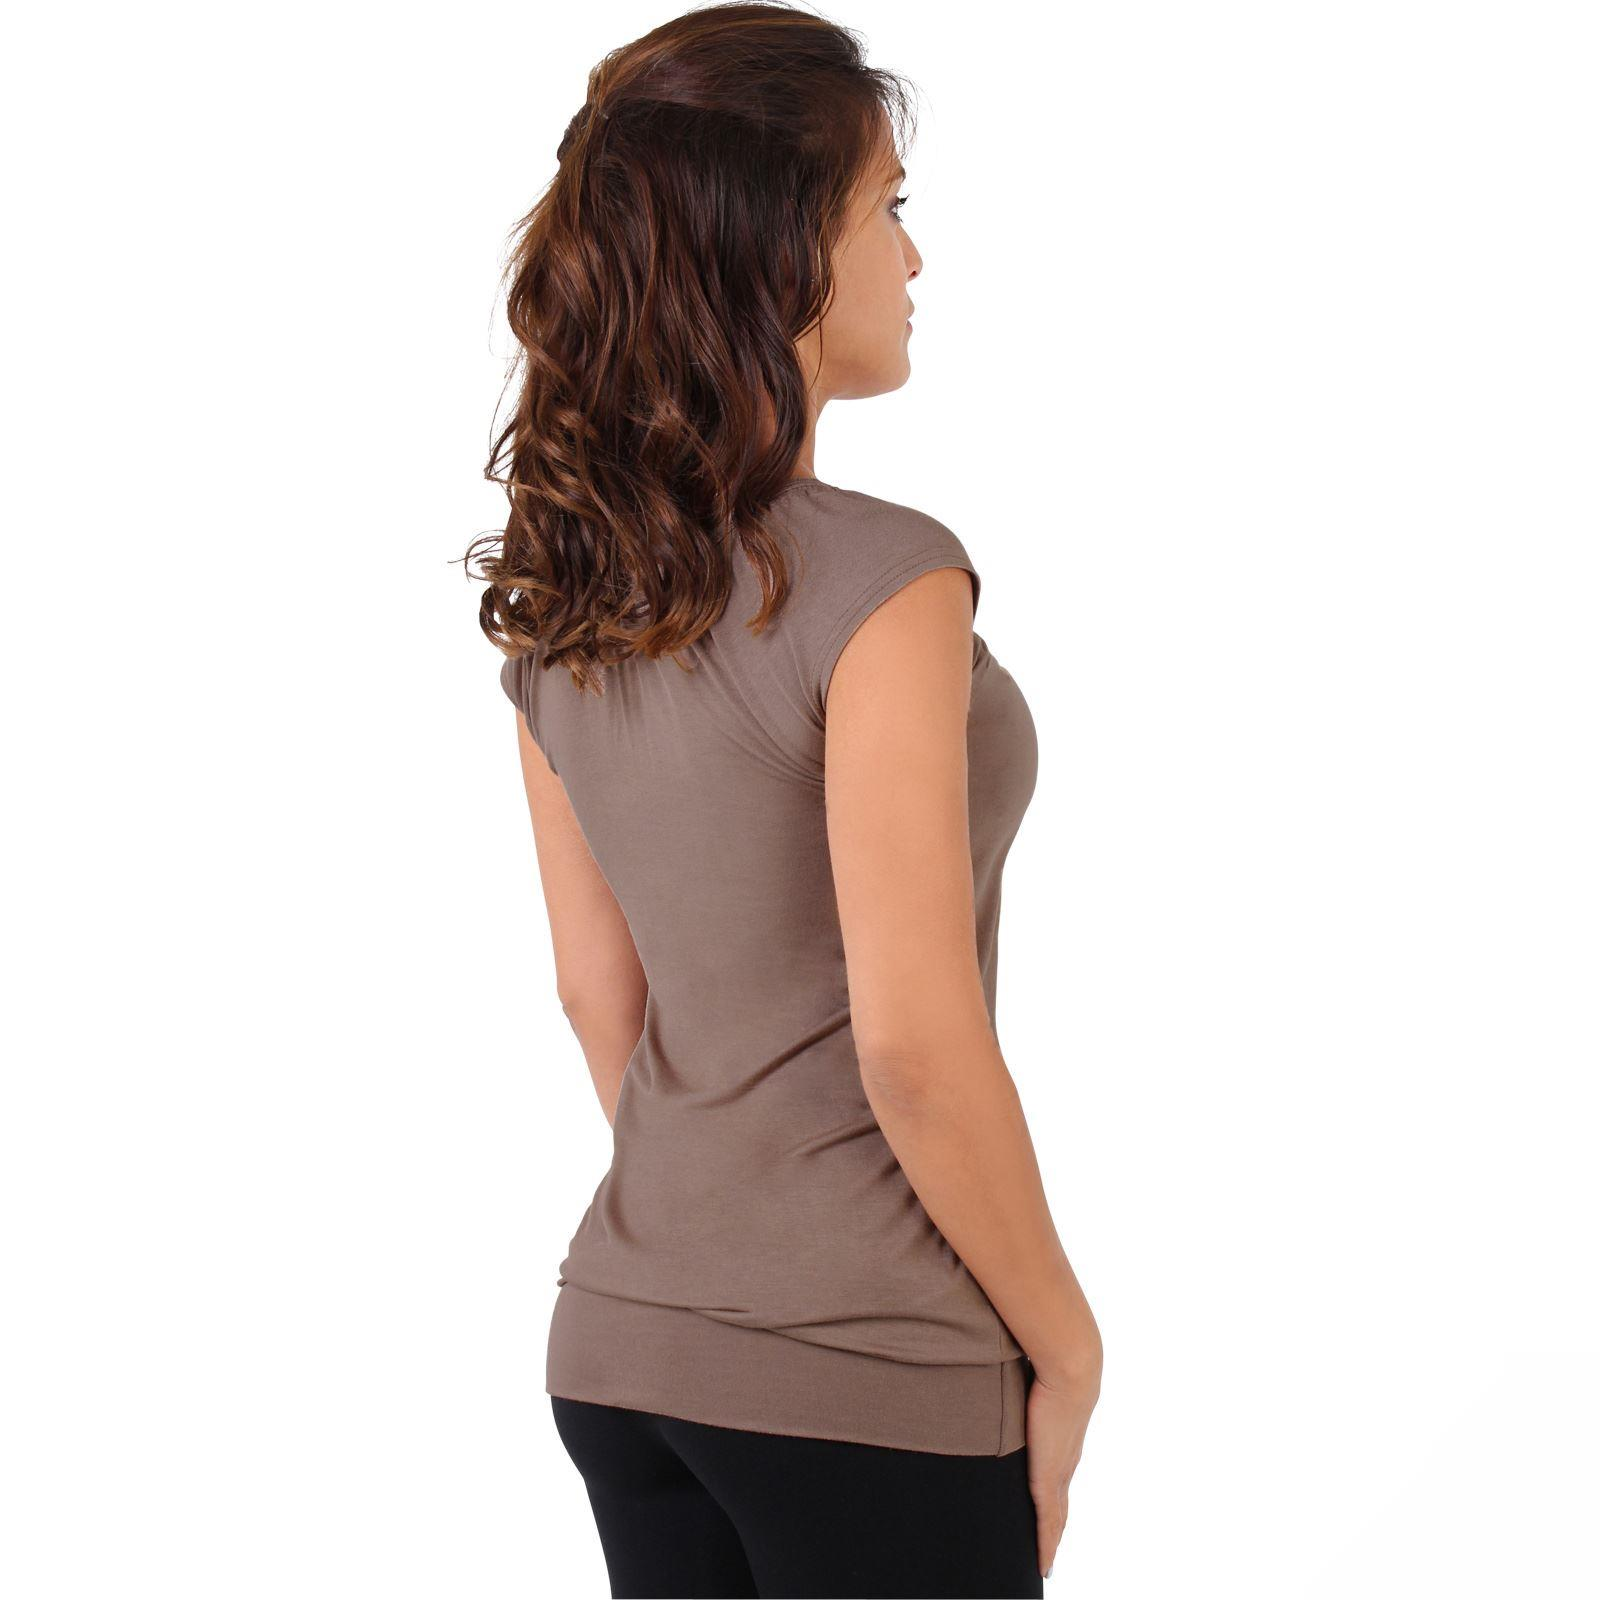 Womens-Ladies-Plain-T-Shirt-Short-Sleeve-Long-Loose-V-Neck-Blouse-Tunic-Top thumbnail 30